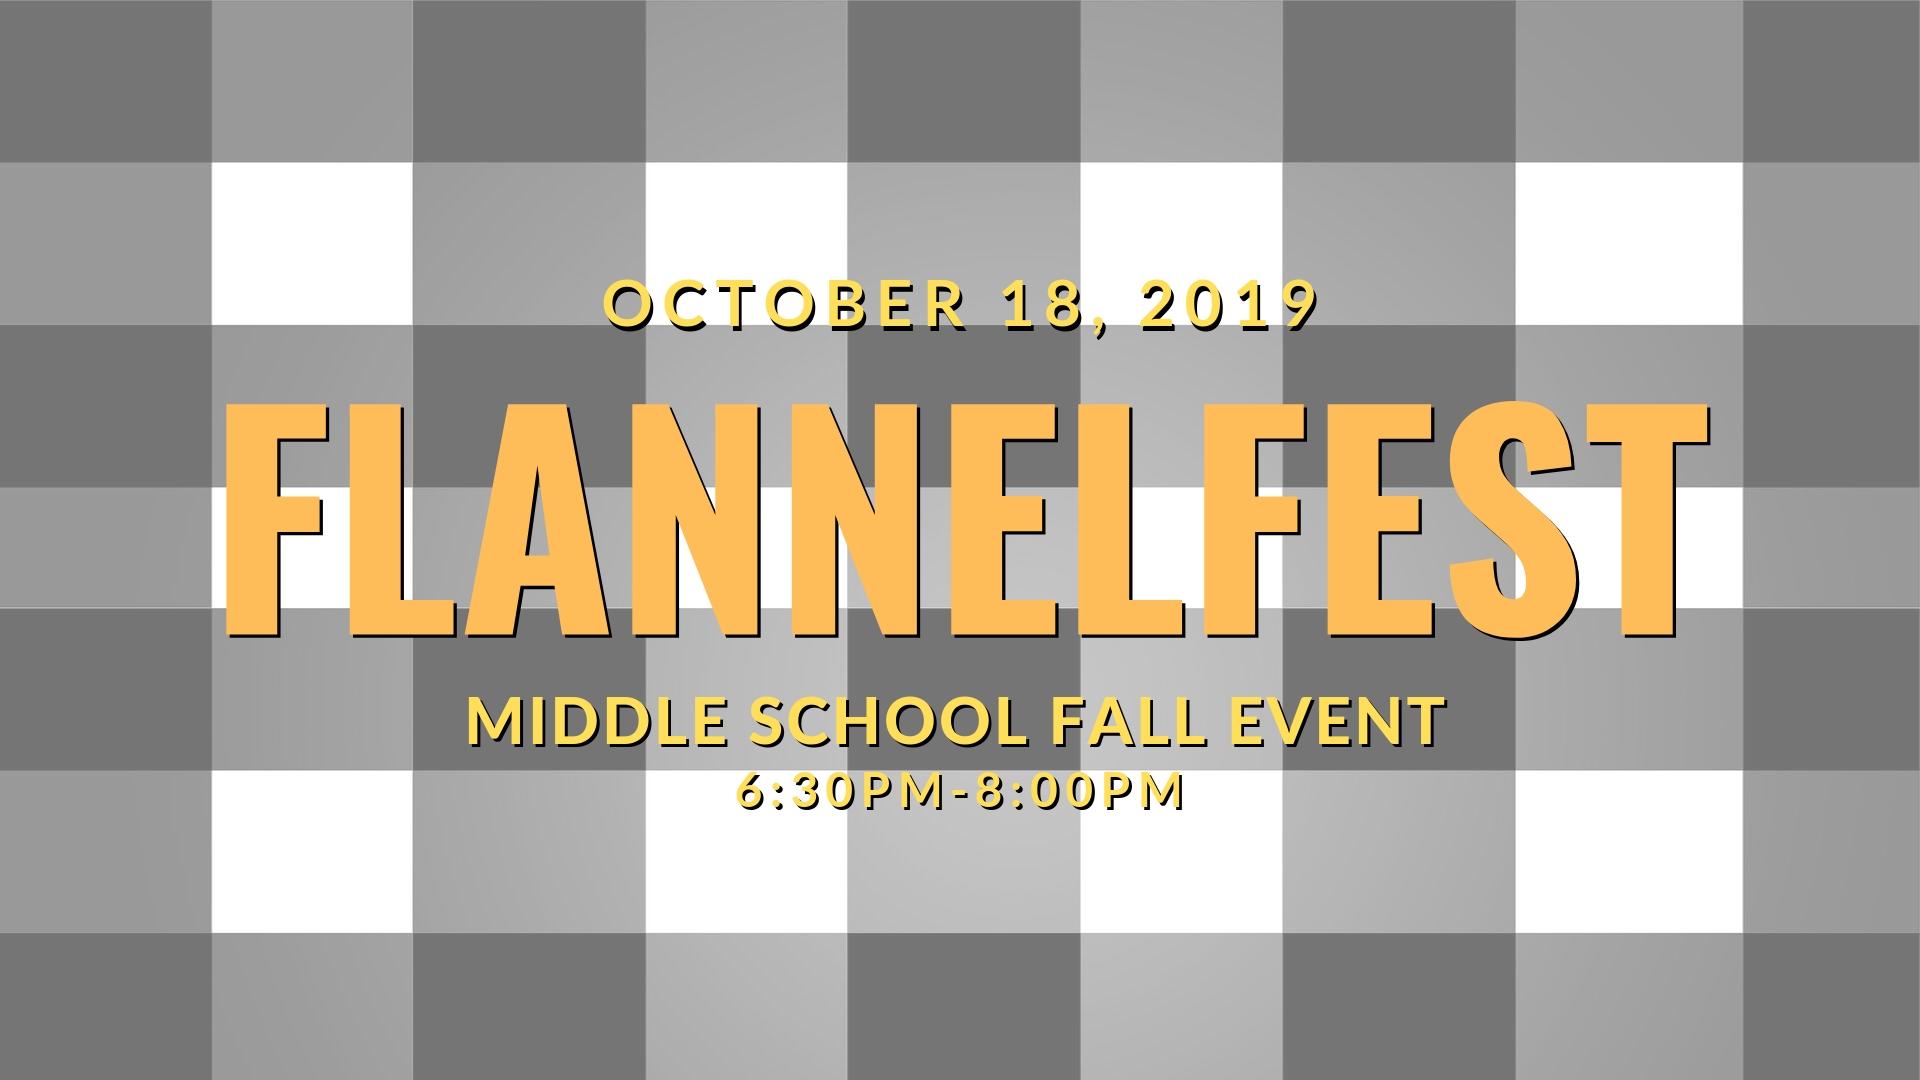 Image: MSM Flannel Fest